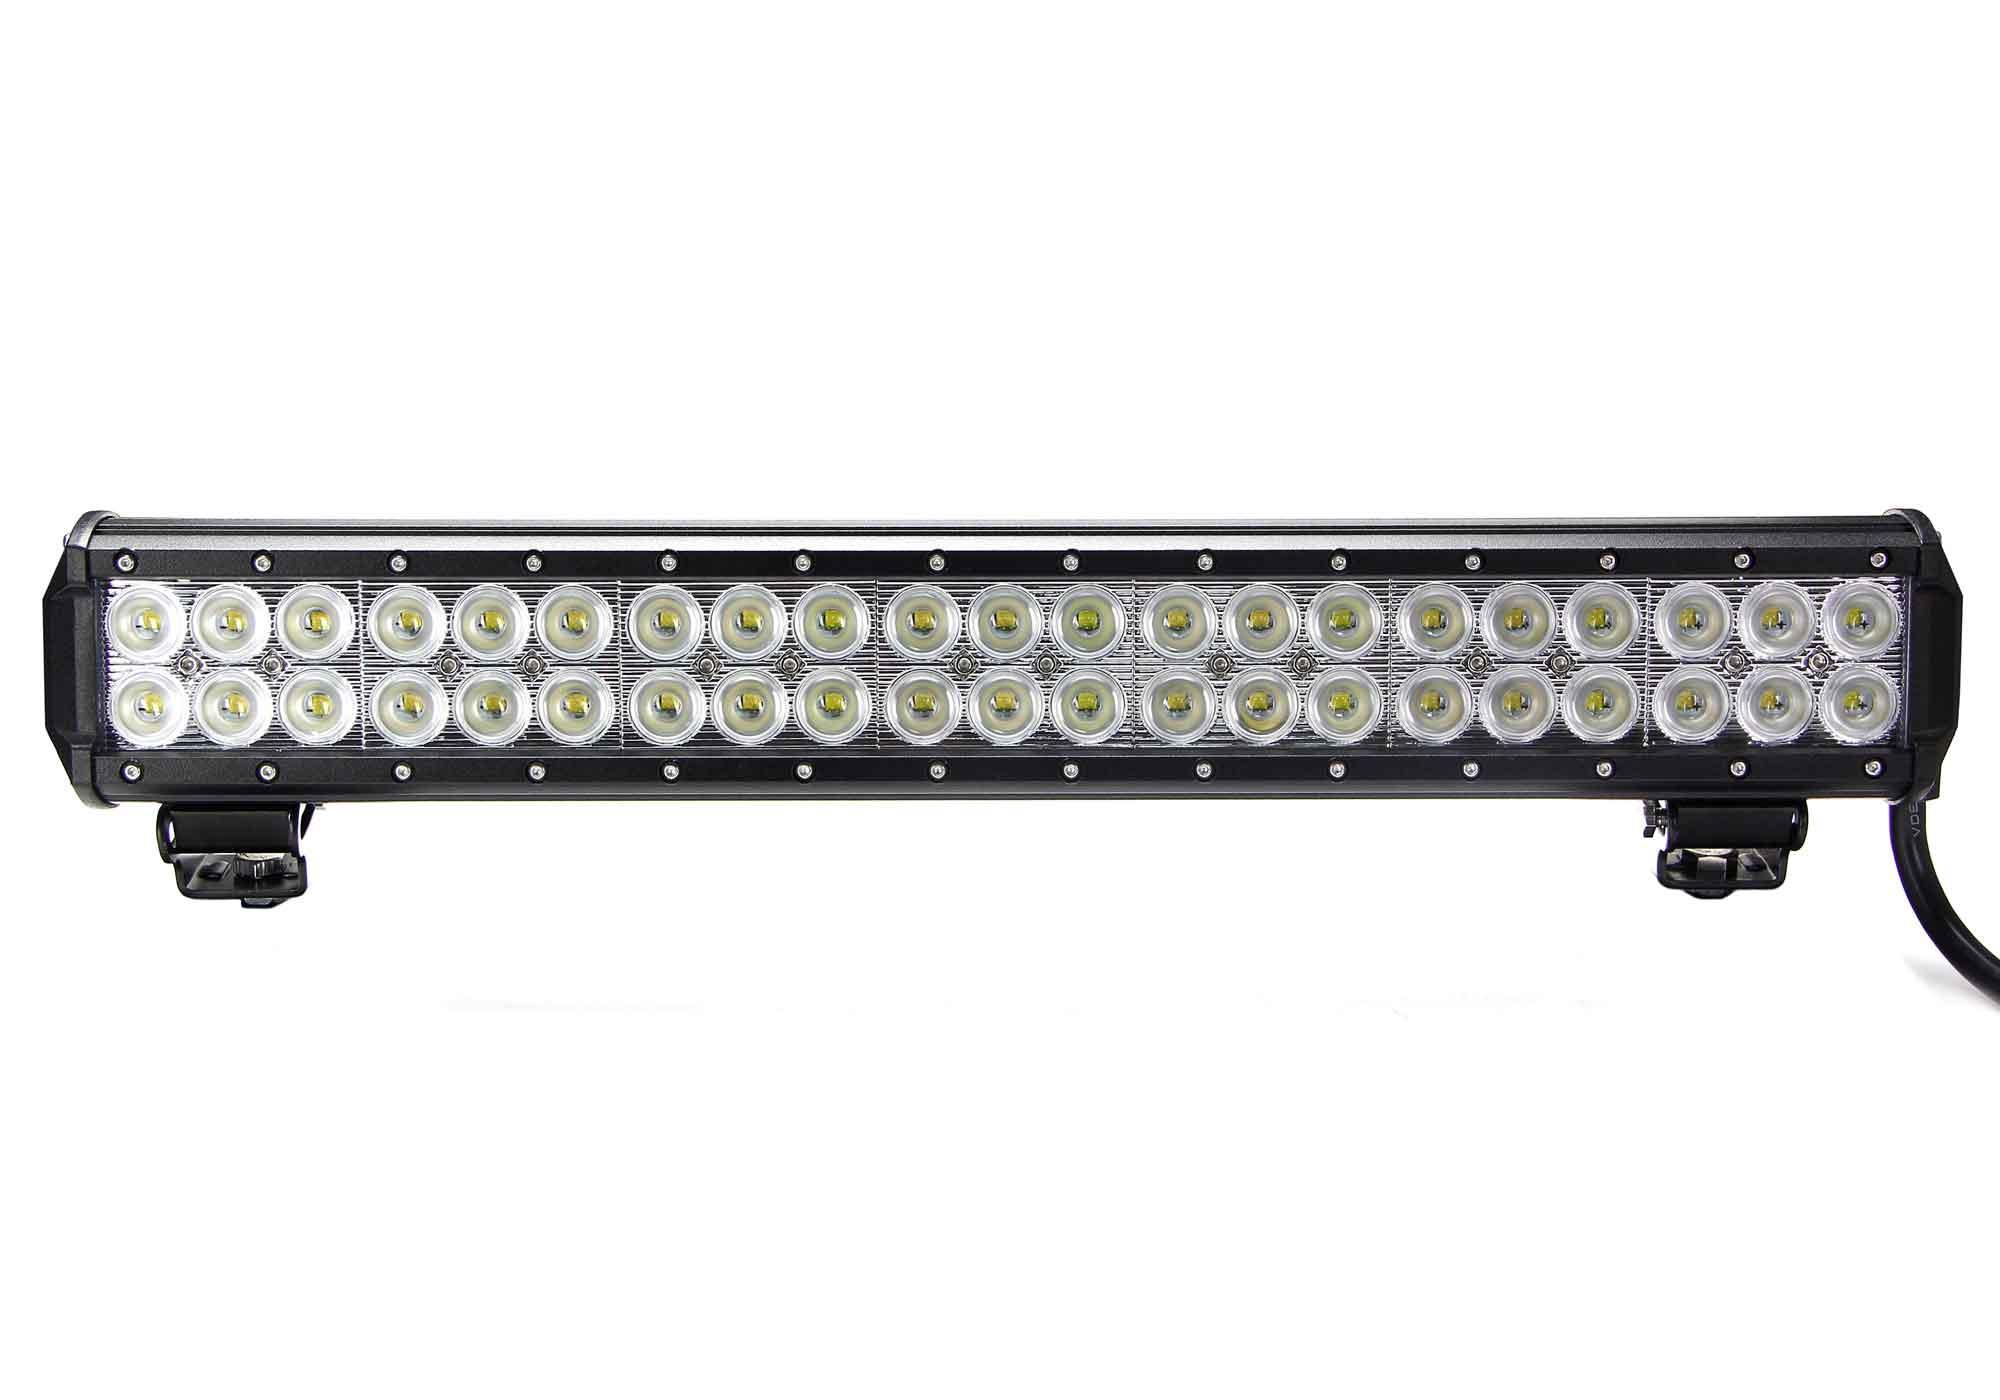 light bar honeywell thermostat anleitung vortex series led 20 inch 126 watt combo tuff lights defcon 22in 126w 4